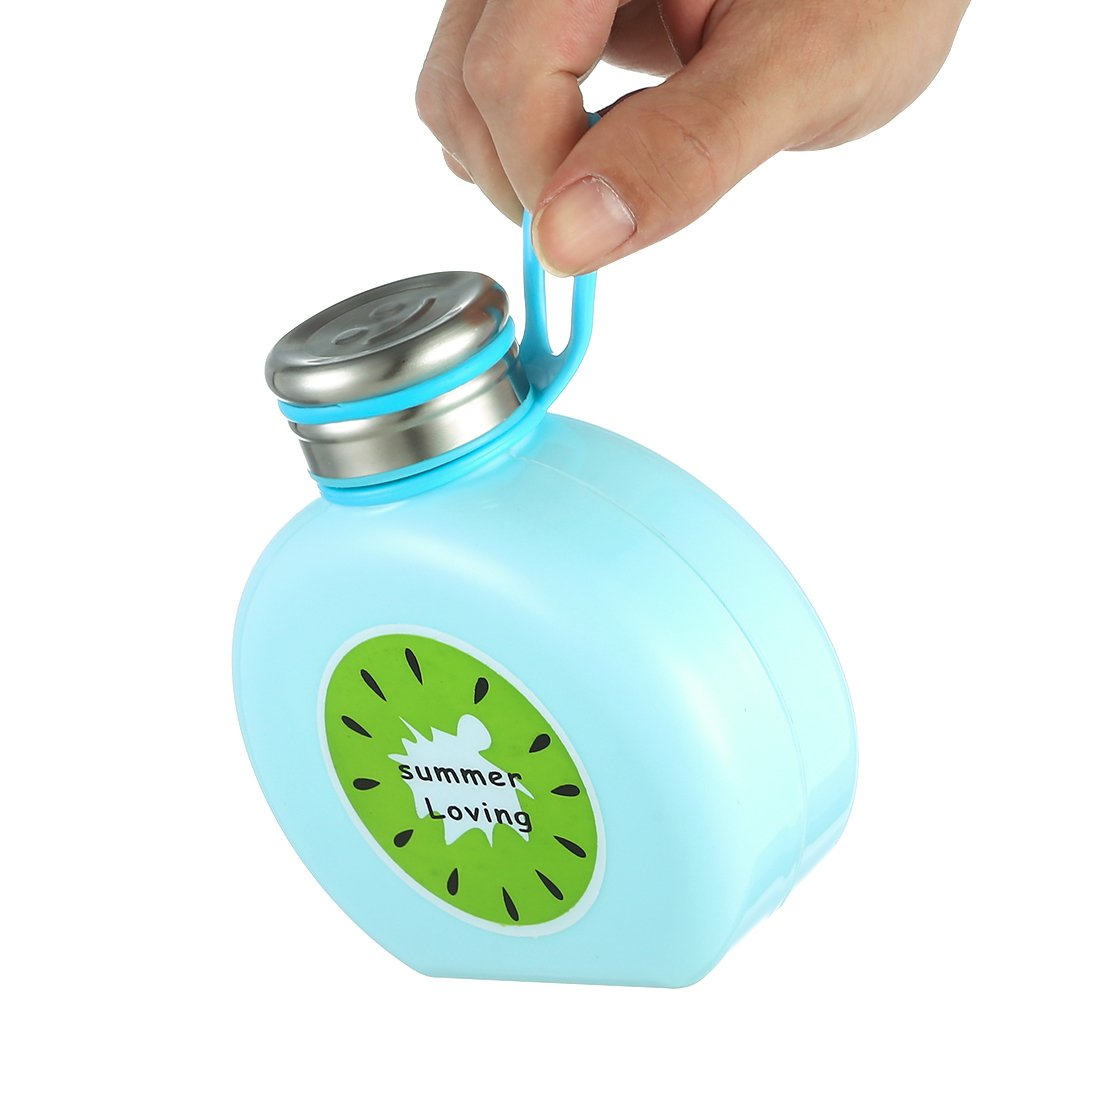 Botella de Vidrio de Frutas Oneisall con Dibujos Animados, Creativa Personalidad, Taza de Agua portátil con asa para niñas, Estudiantes, 300 ML, Color Azul, ...